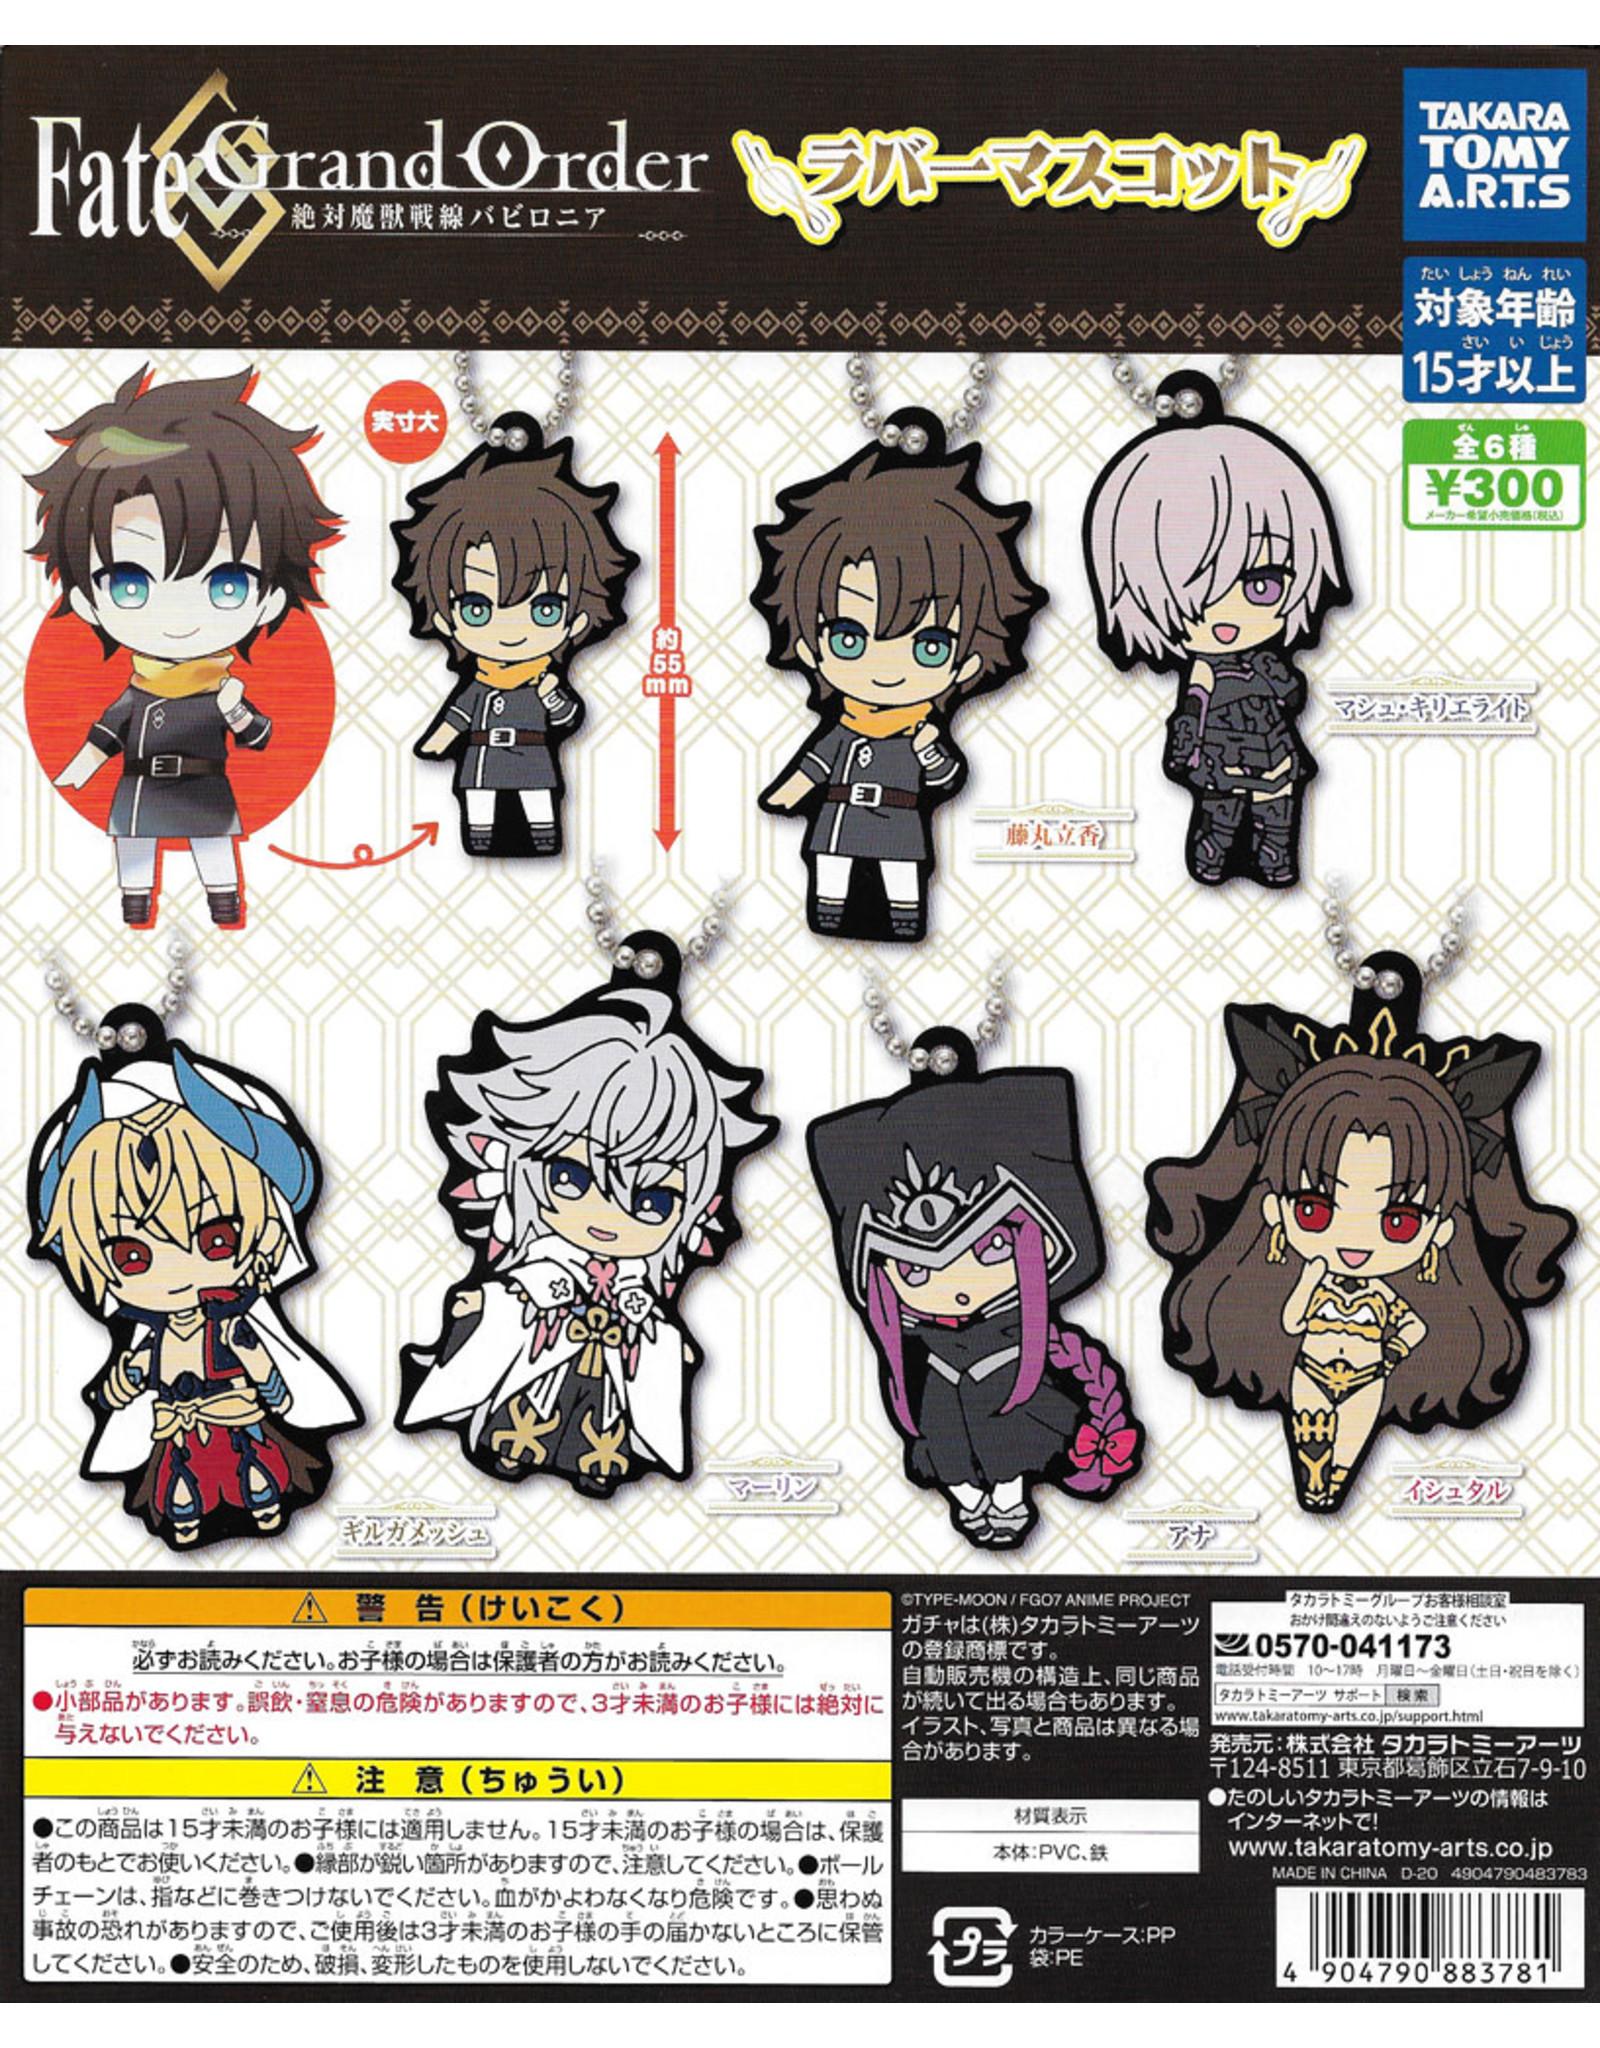 Fate/Grand Order Rubber Mascot Keychain